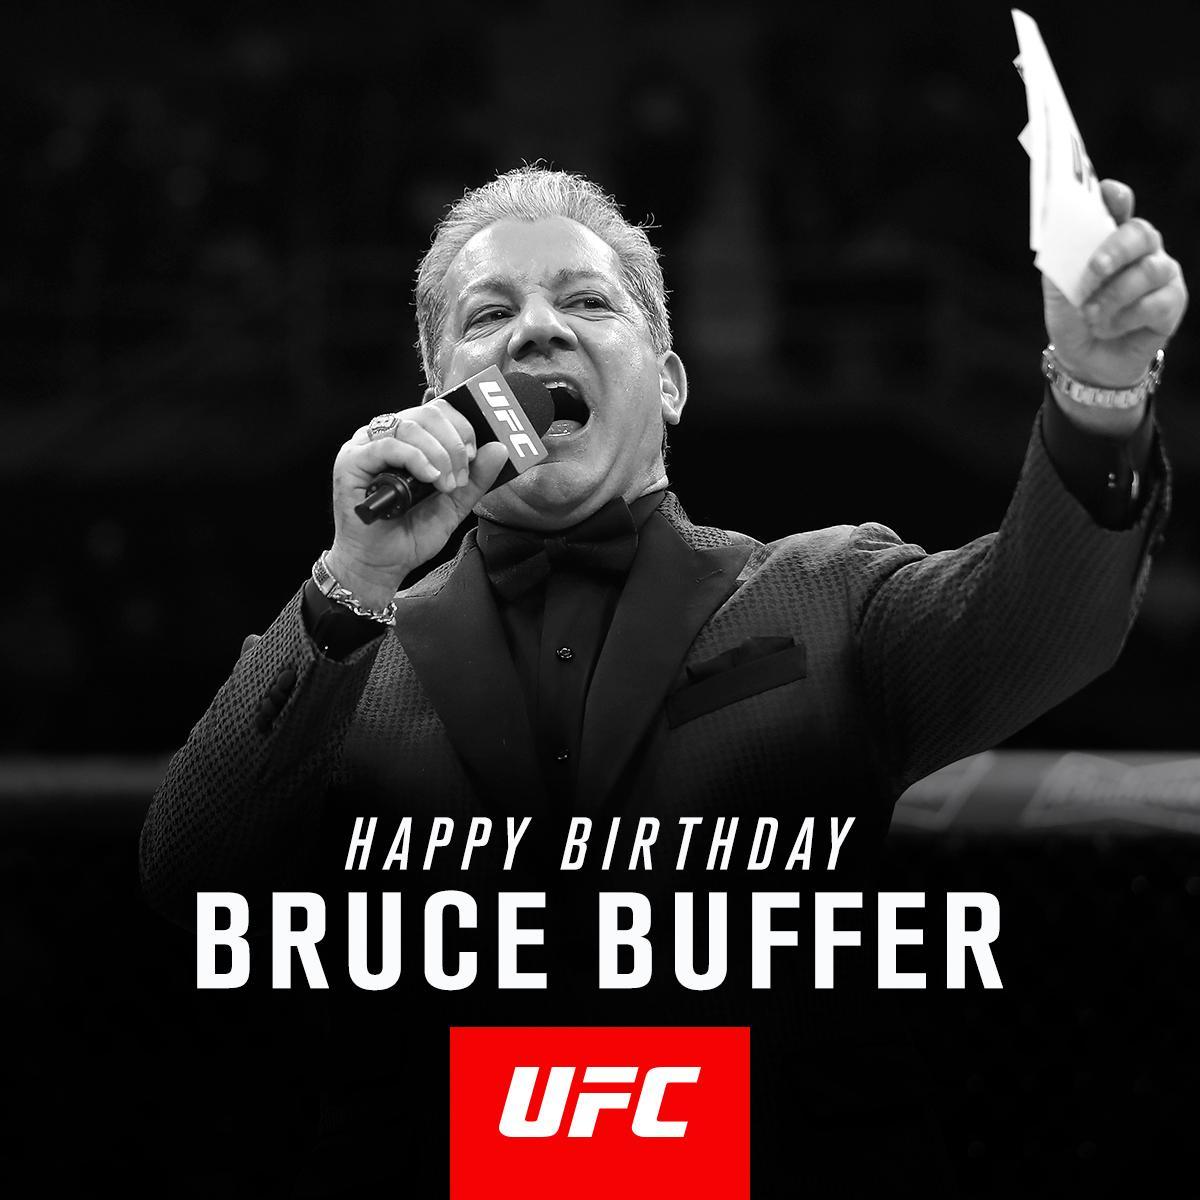 Happy Birthday to the 'Veteran Voice of the Octagon' @BruceBuffer! https://t.co/qfvVHCcr0U